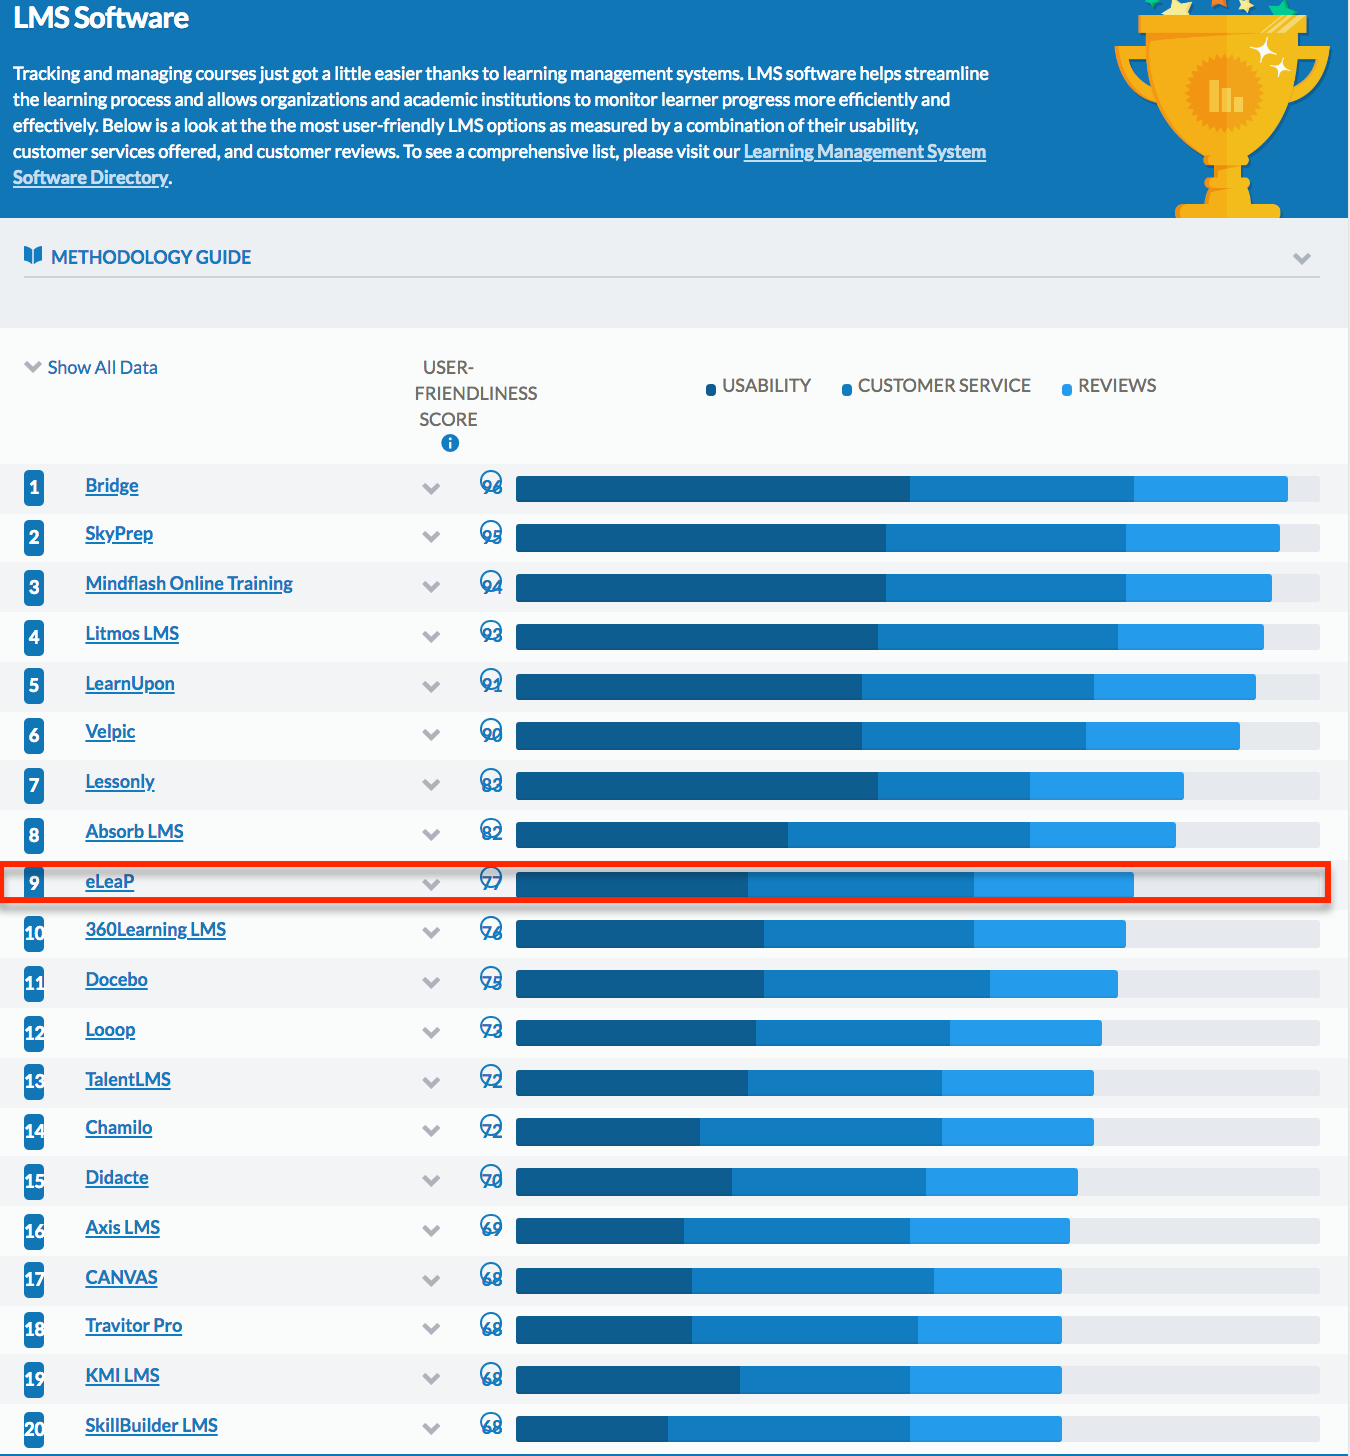 Top 10 Lms Ranking Eleap